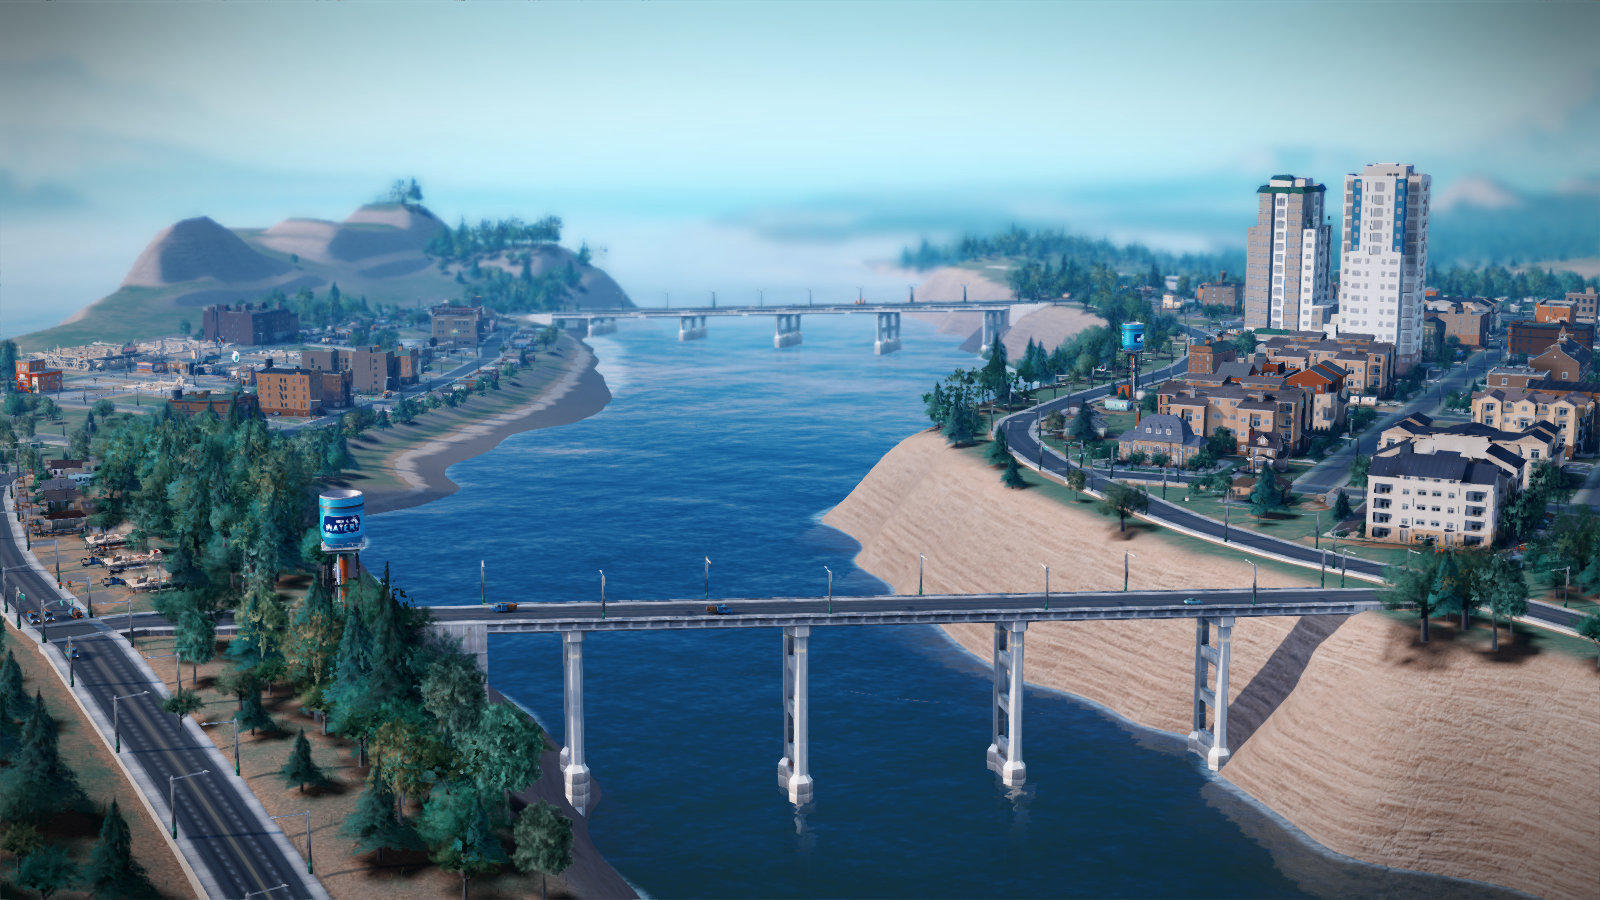 [Imagen]Imágenes de ciudades de Simcity BAWewwCCMAAHfi2